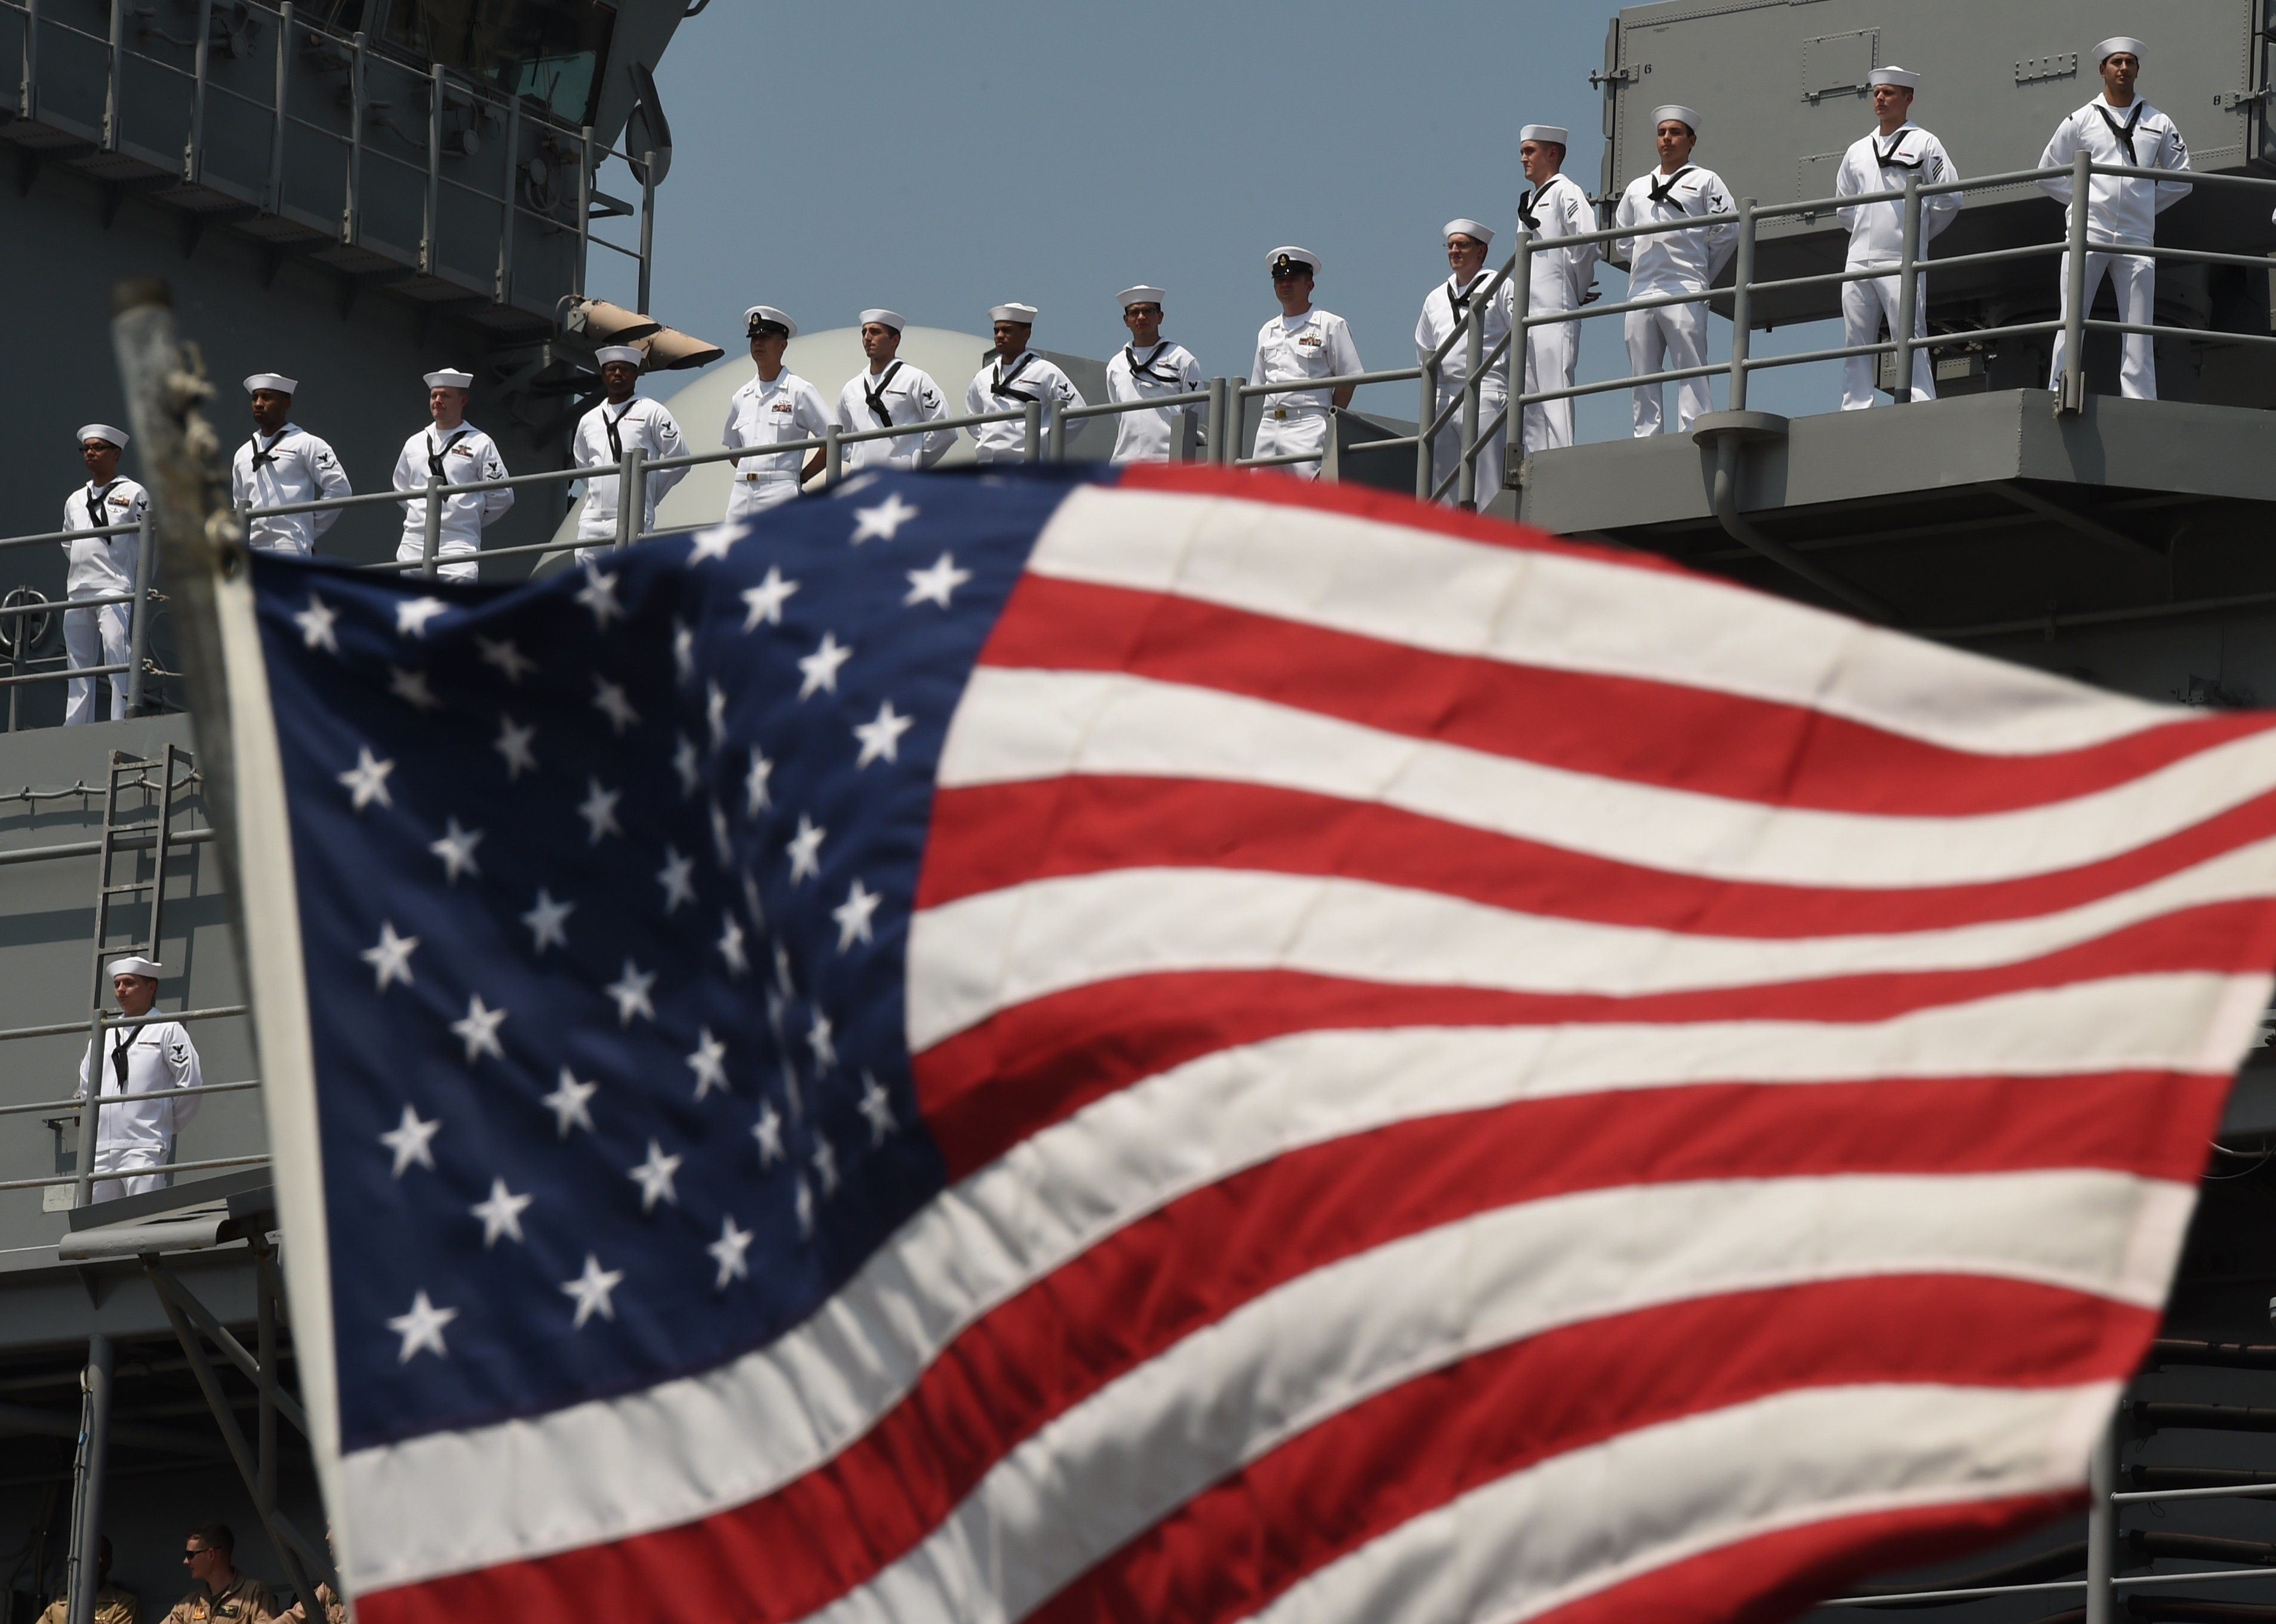 U.S. Navy Slaps Drinking Ban On 18,600 Sailors After Okinawa